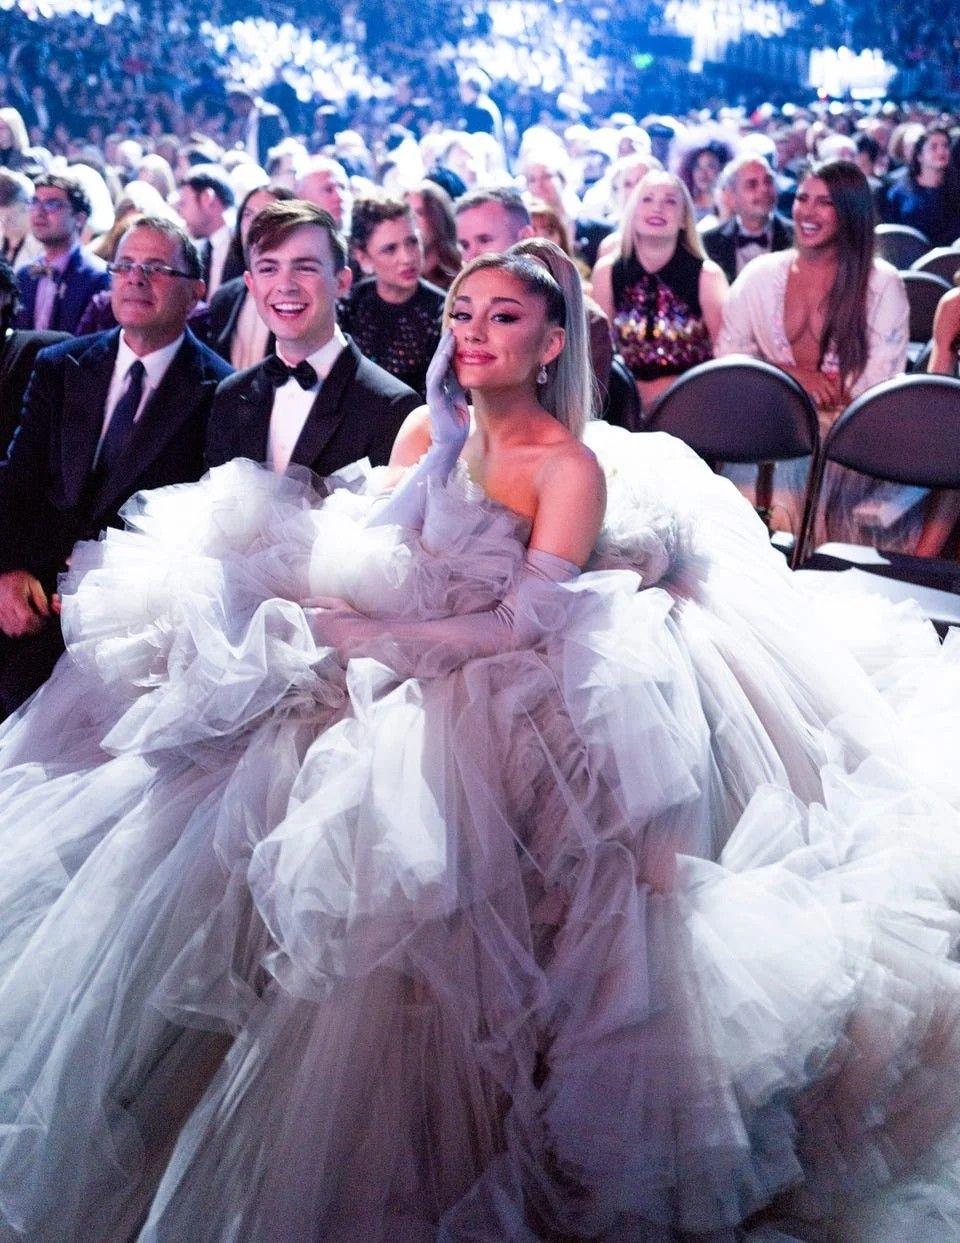 Pin By Kristiyana On Ariana Grande In 2020 Ariana Grande